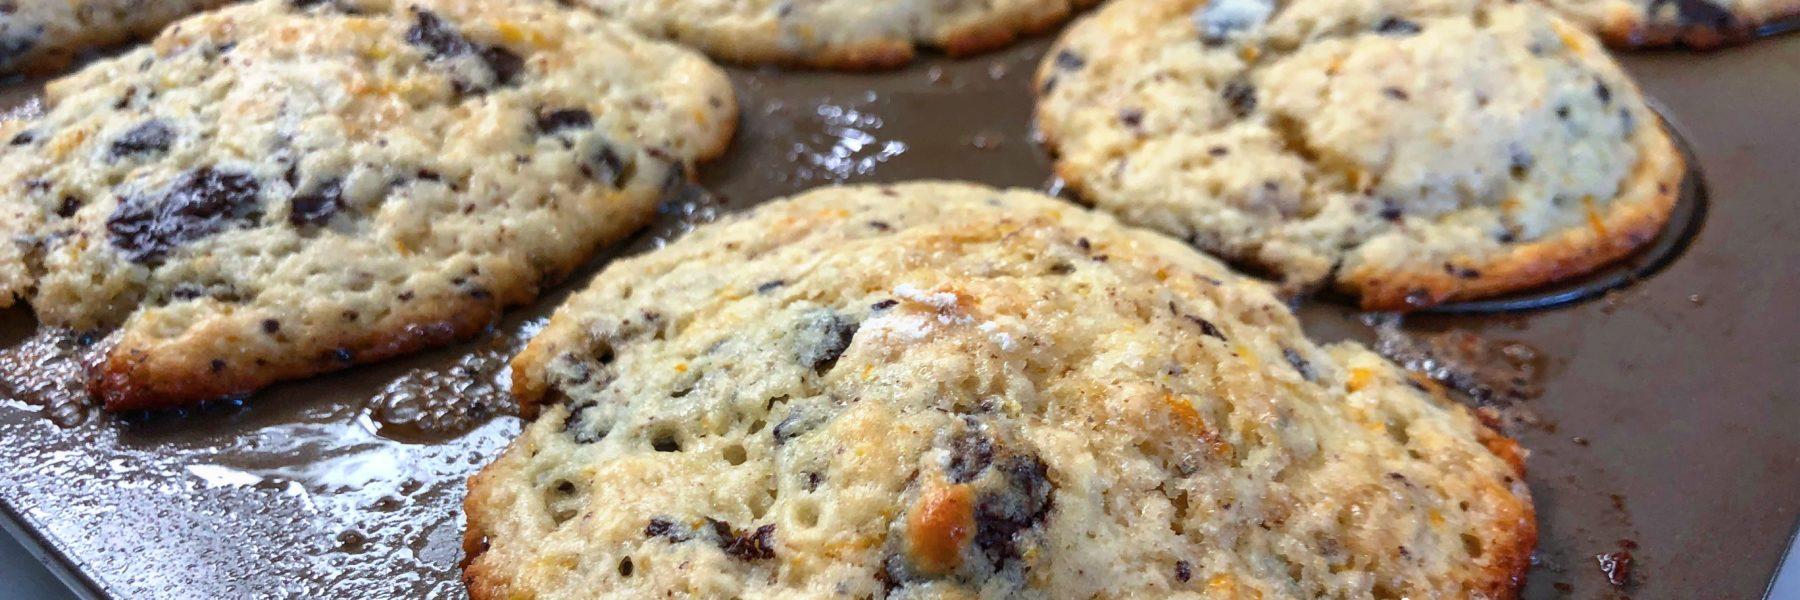 morning-muffins